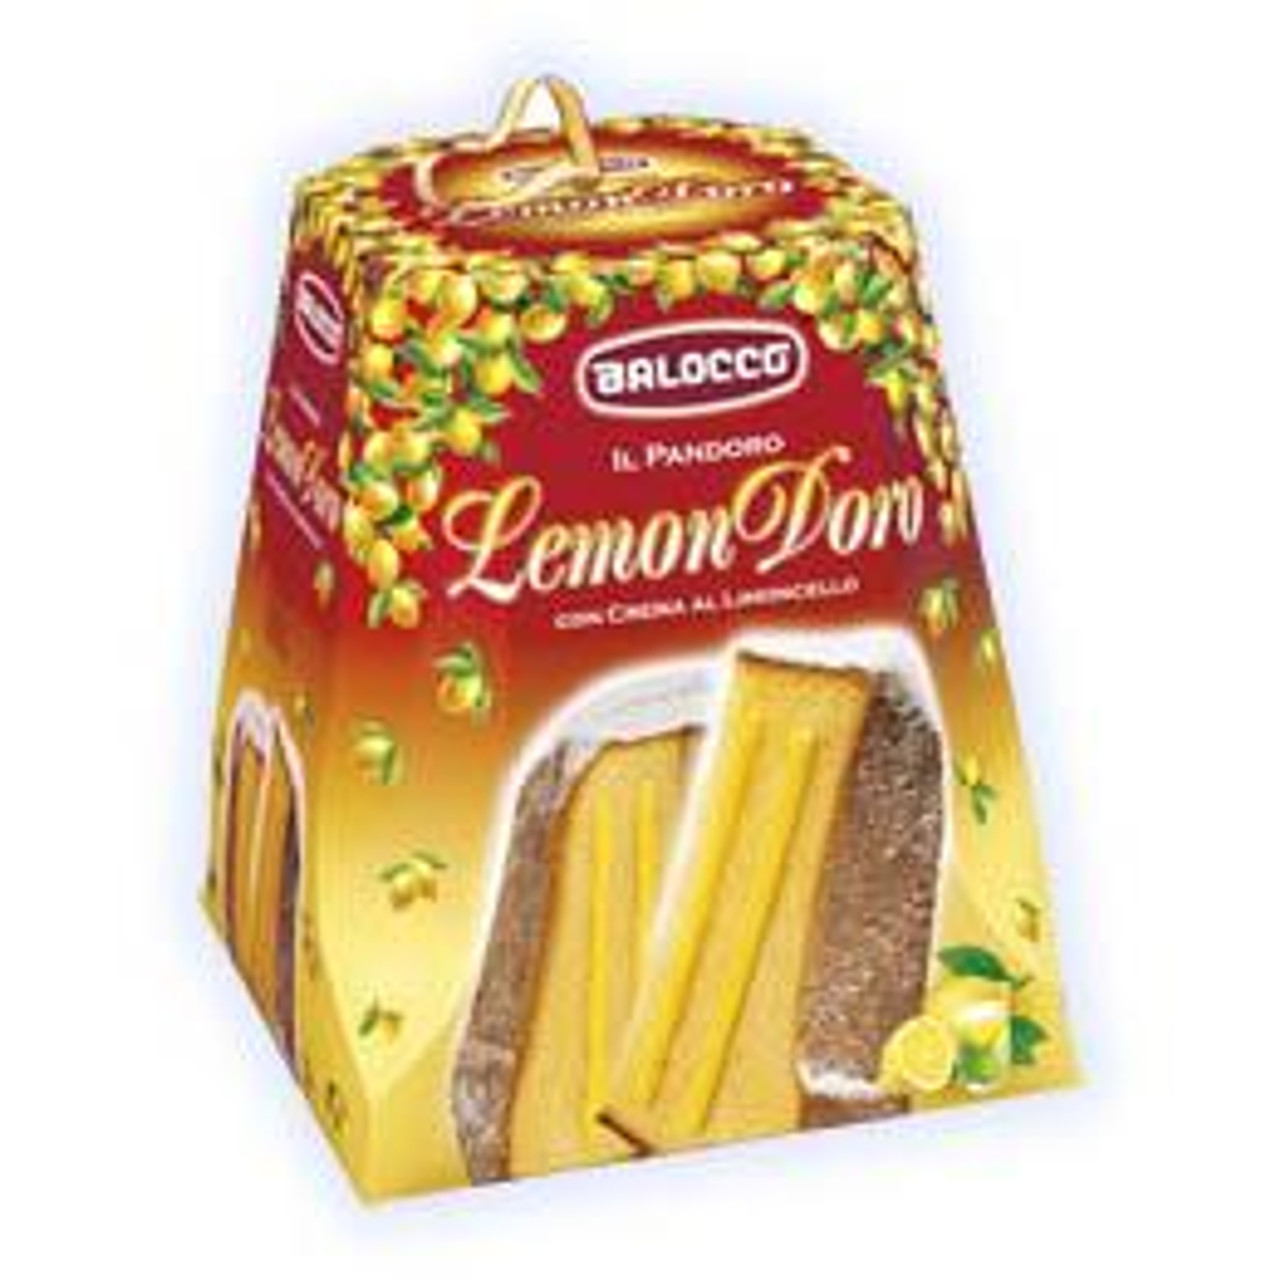 Balocco Lemon D'Oro Pandoro